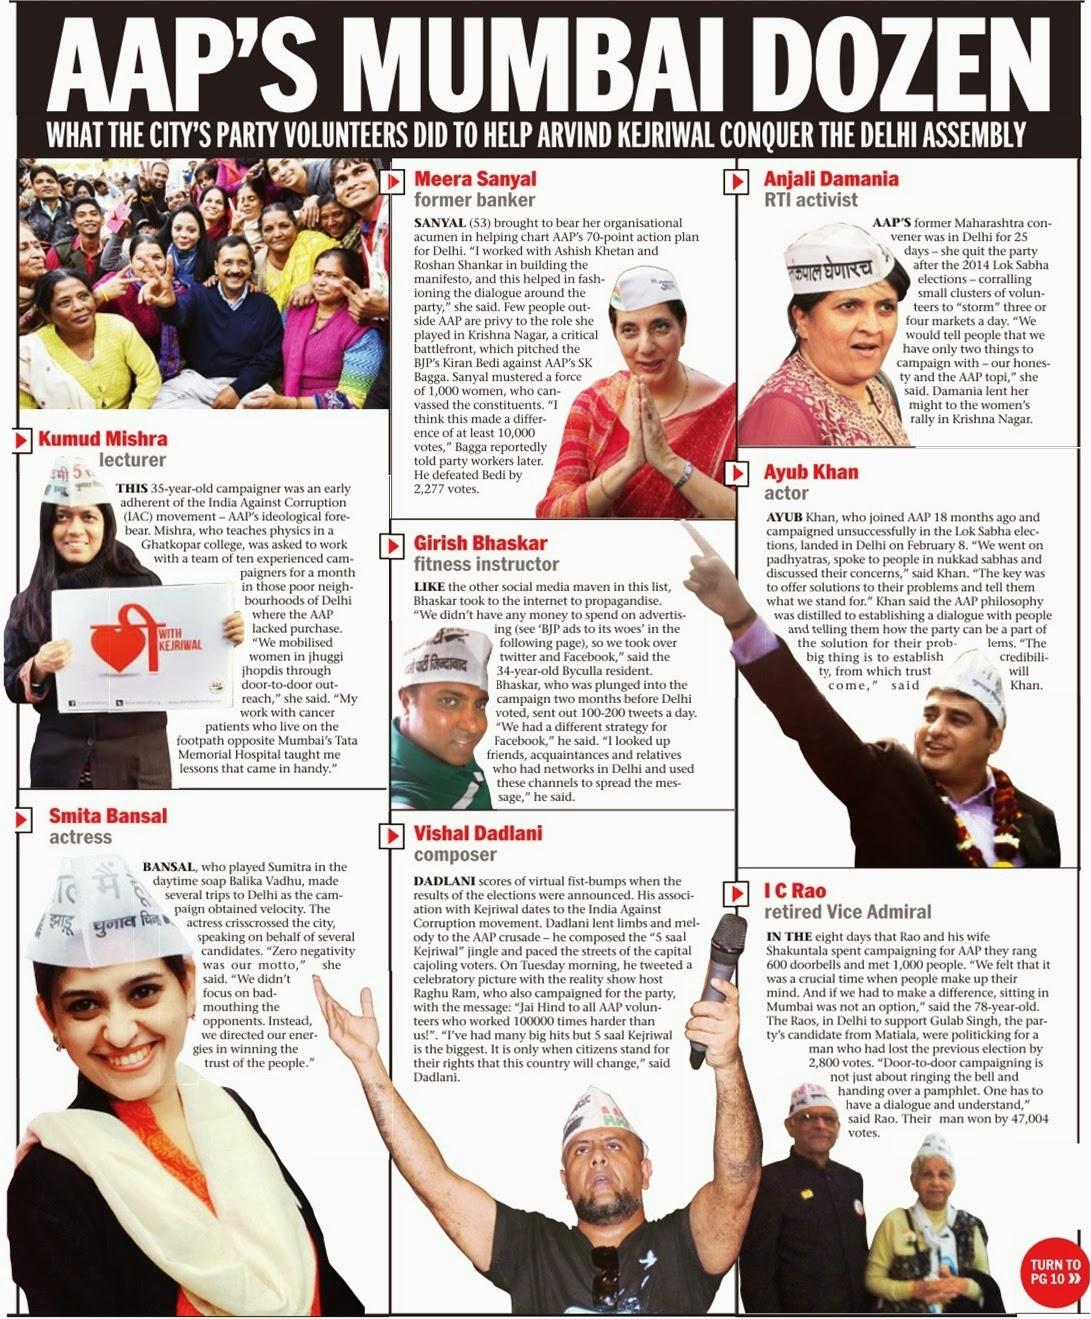 http://epaperbeta.timesofindia.com/NasData//PUBLICATIONS/MIRROR/MUMBAI/2015/02/11/Article/008/11_02_2015_008_006.jpg